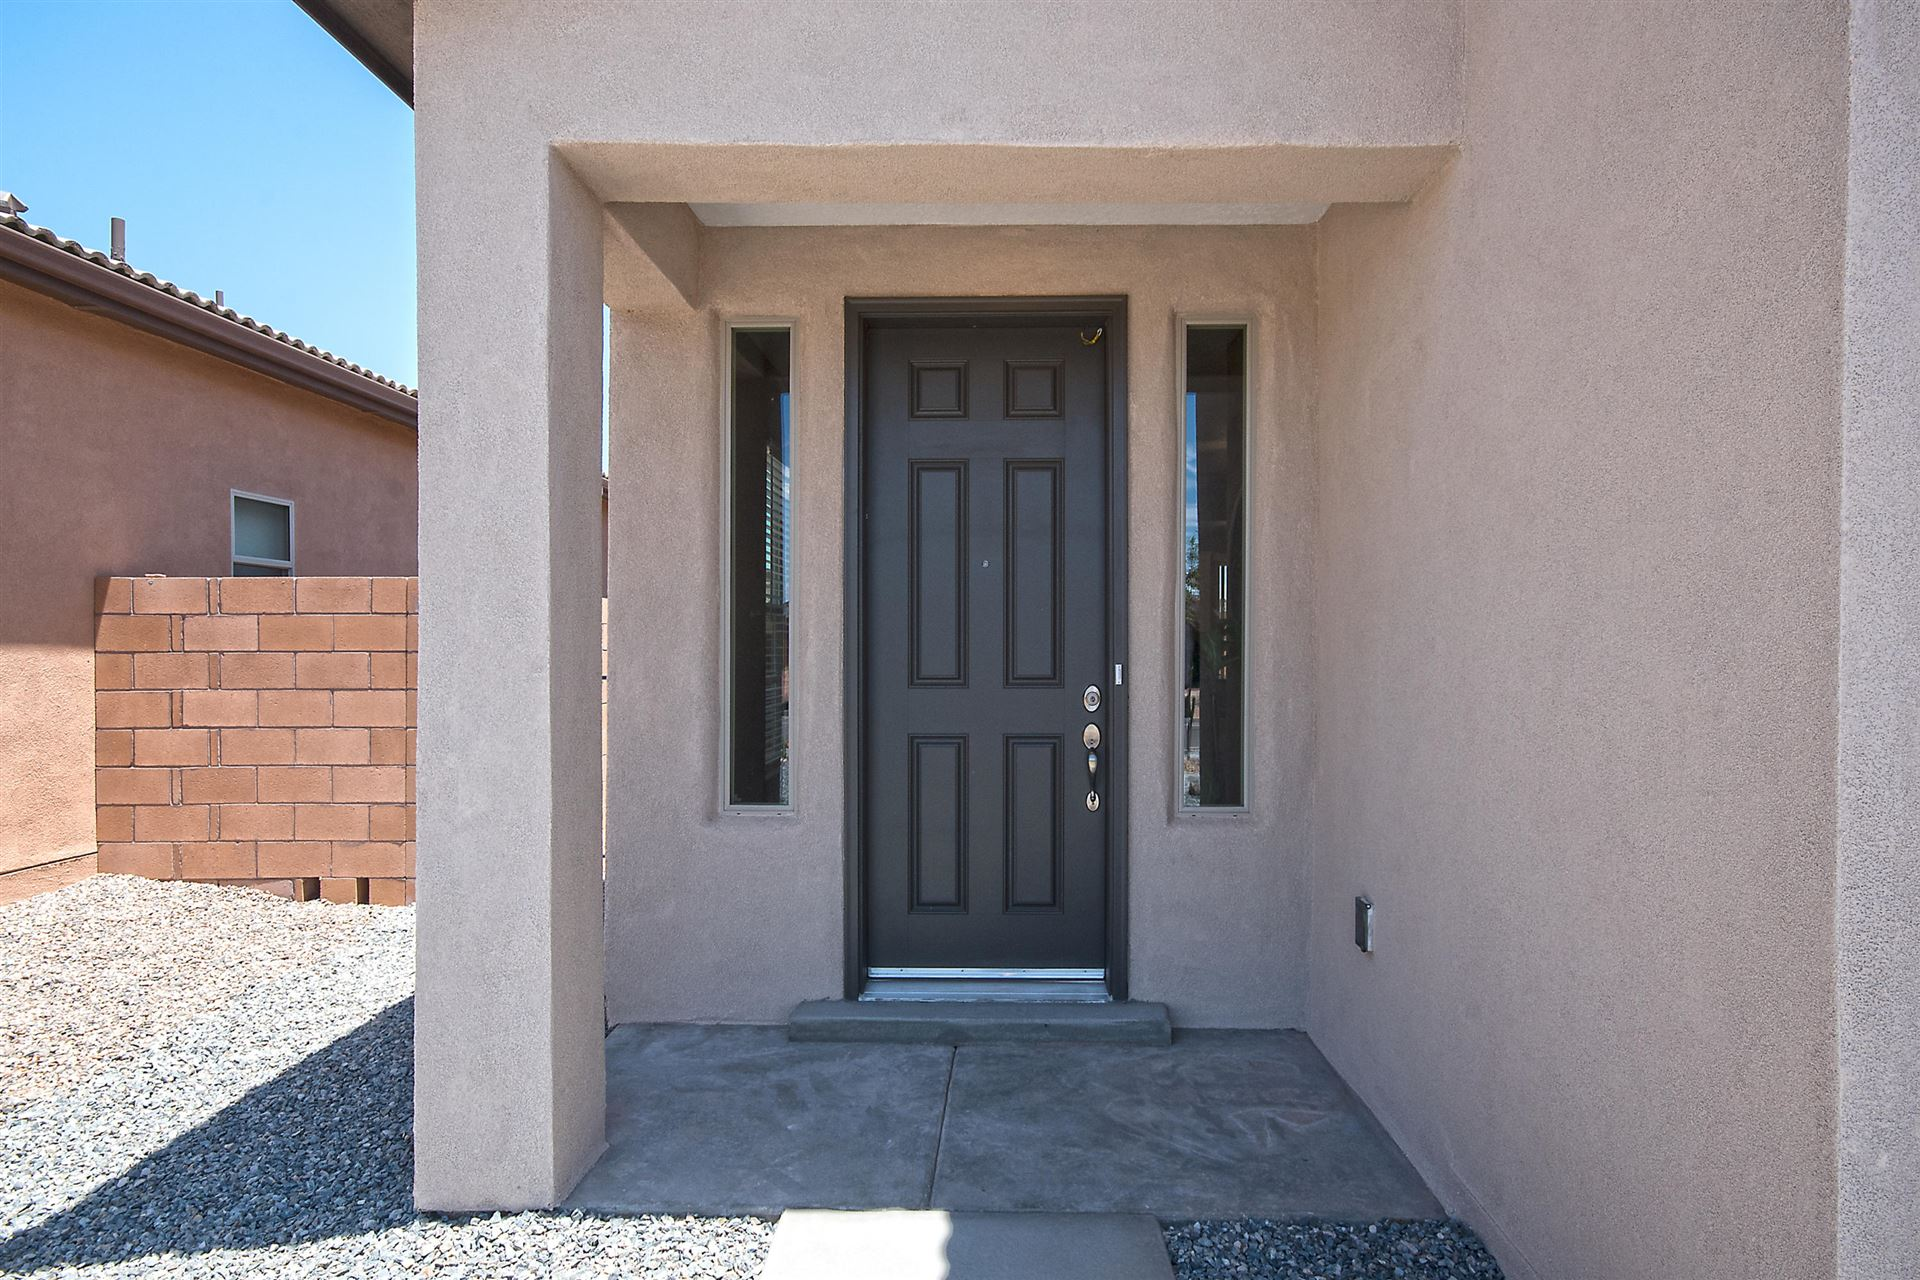 Photo of 4022 Mountain Trail NE, Rio Rancho, NM 87144 (MLS # 971800)